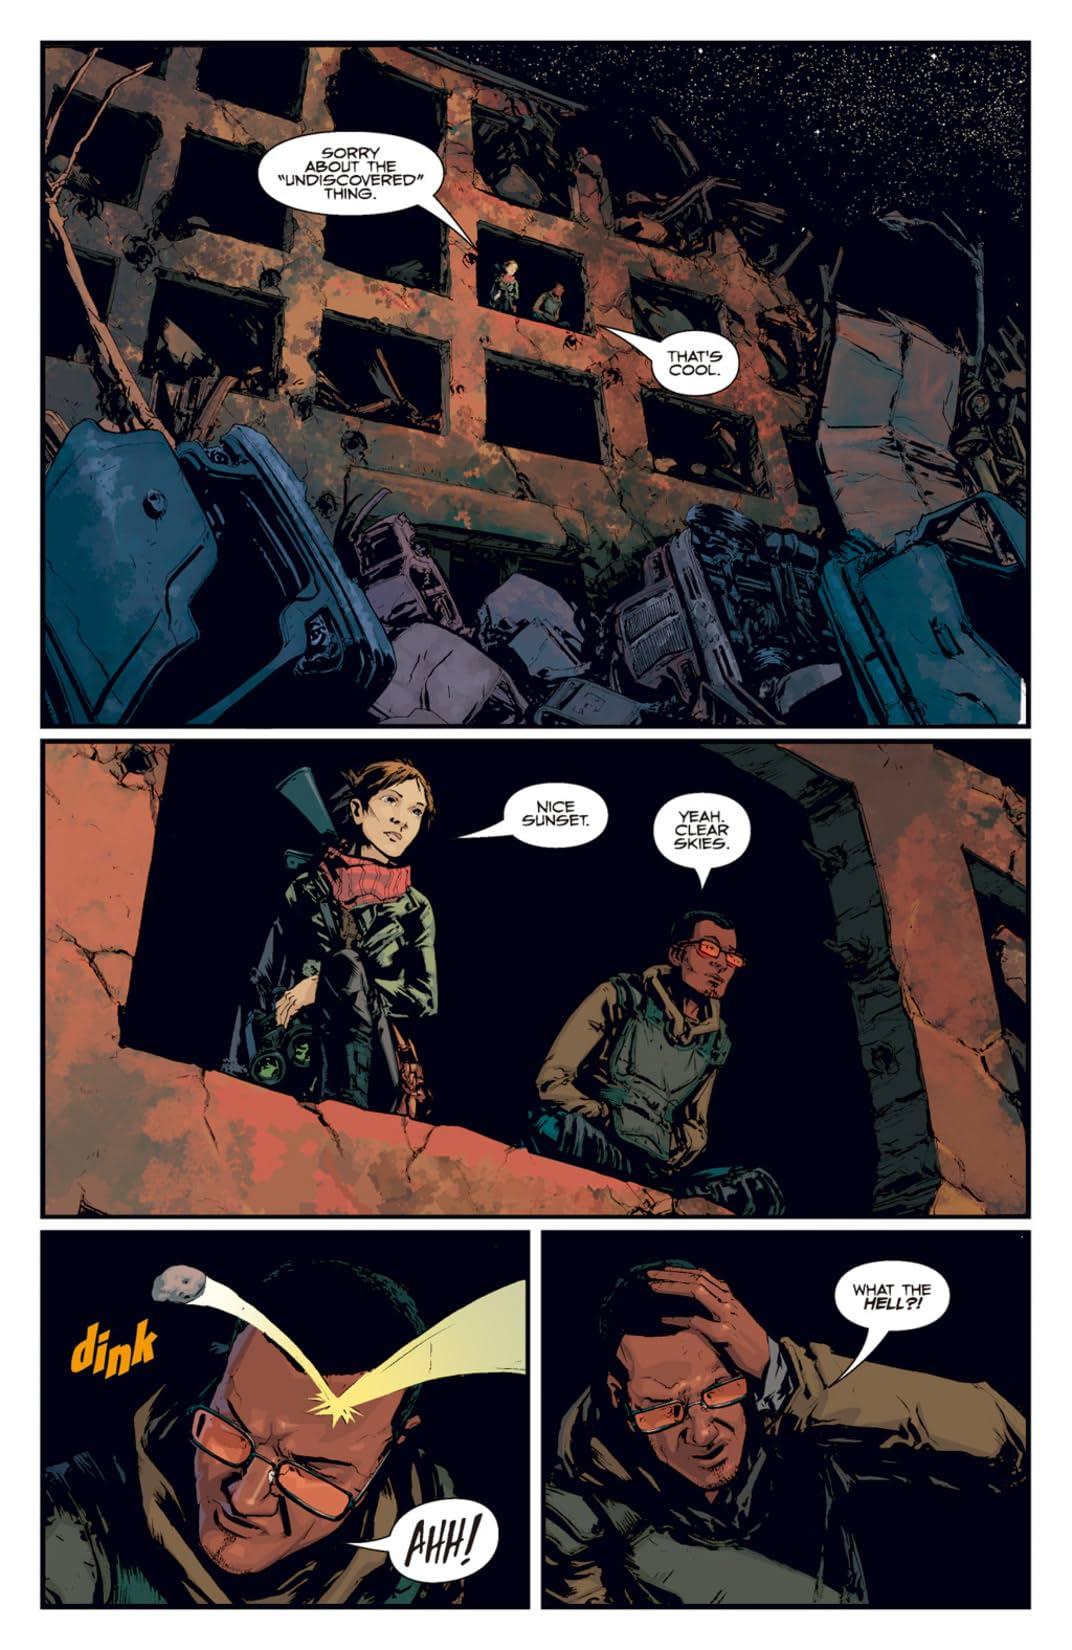 The Terminator: 2029 #1